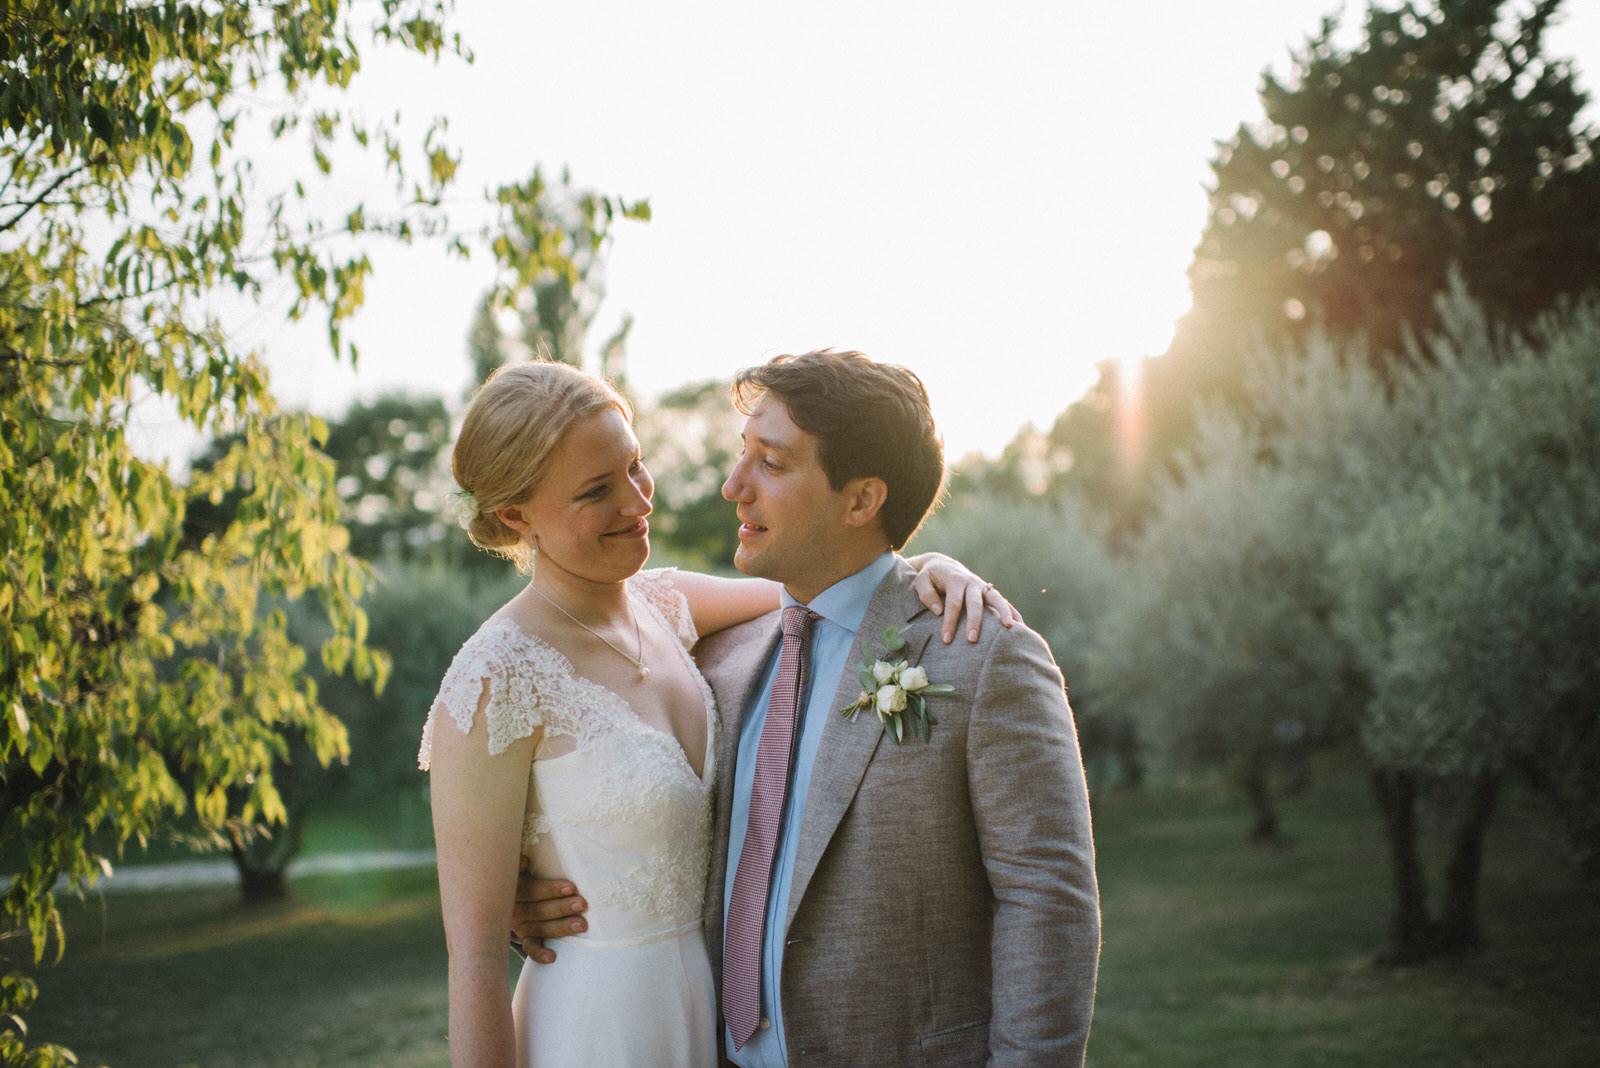 028-LOURMARIN-WEDDING-PHOTOGRAPHER-PROVENCE-WEDDING-ALTERNATIVE-WEDDING-PHOTOGRAPHY-FRANCE-PROVENCE-GARDEN-WEDDING.JPG